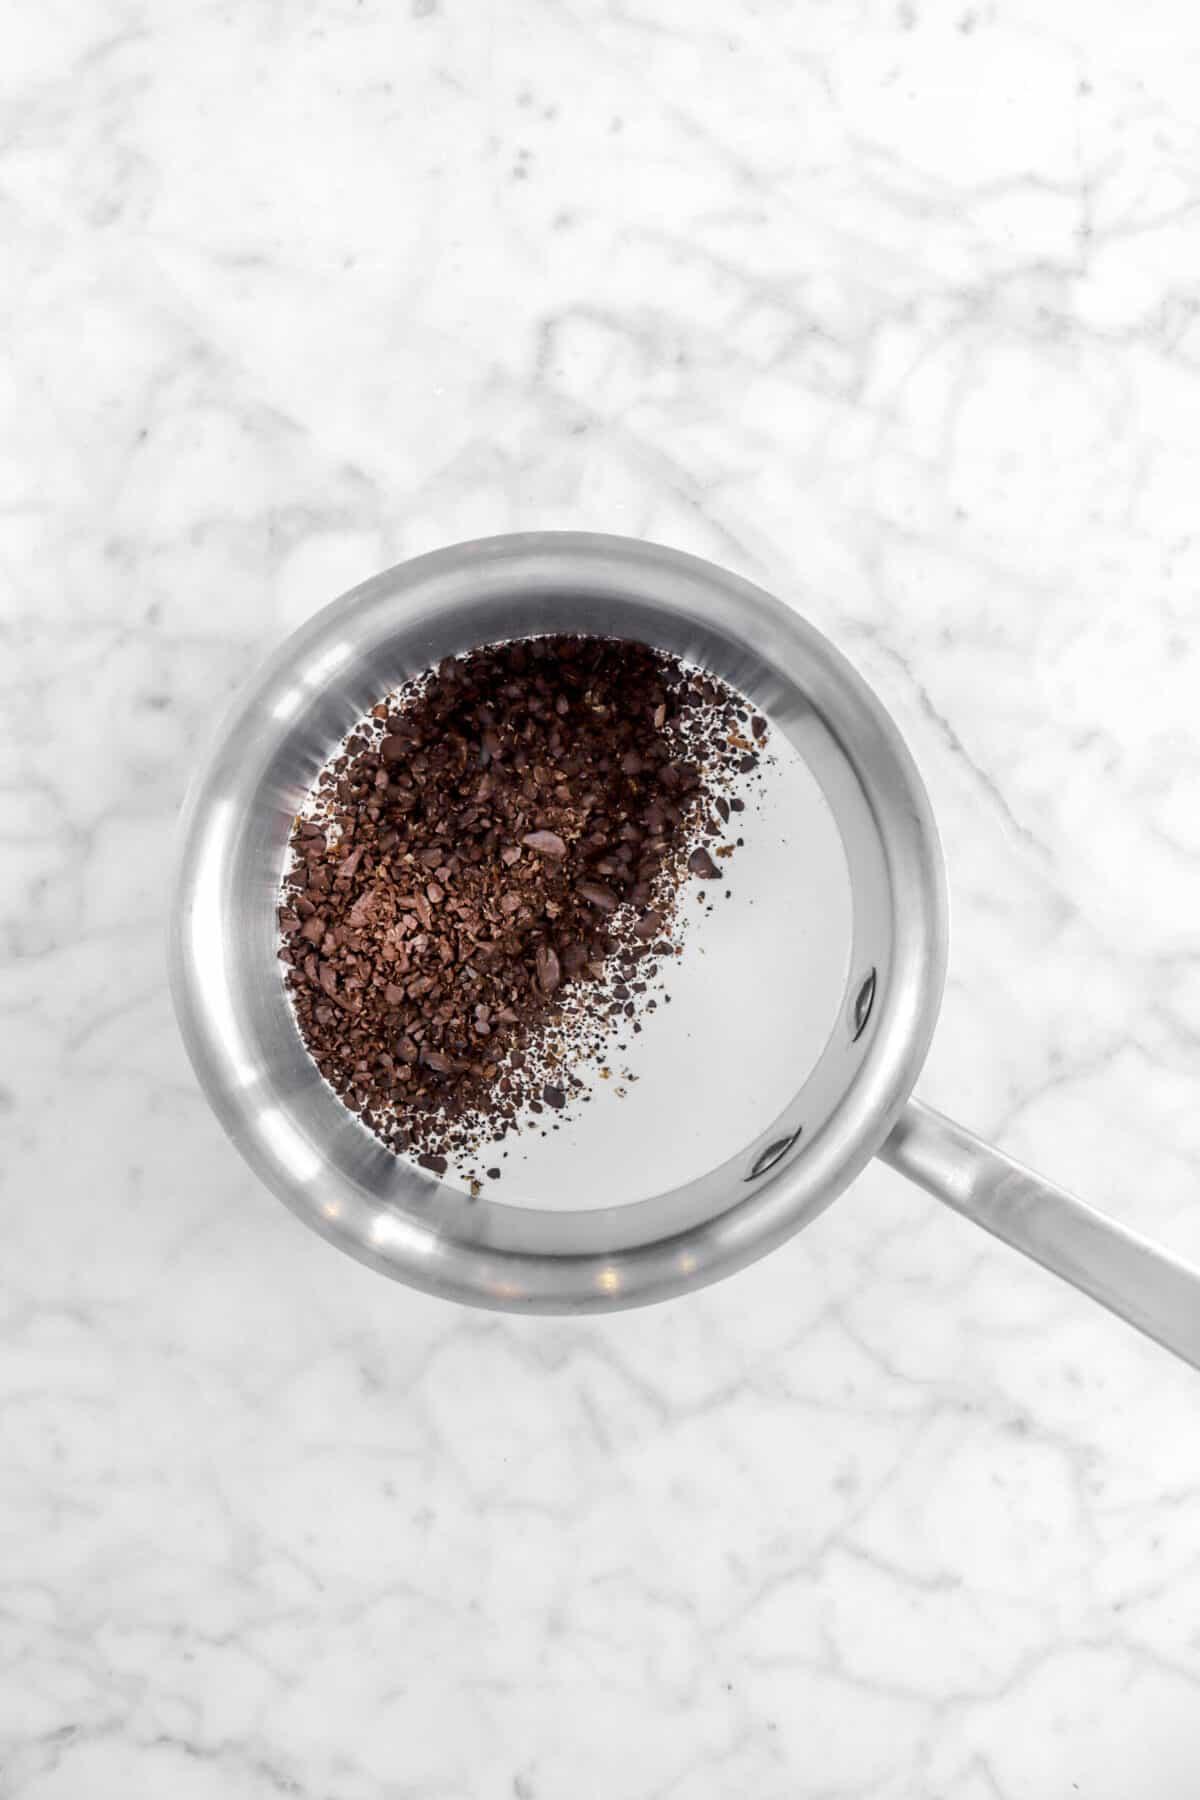 coffee and cream in a small pot